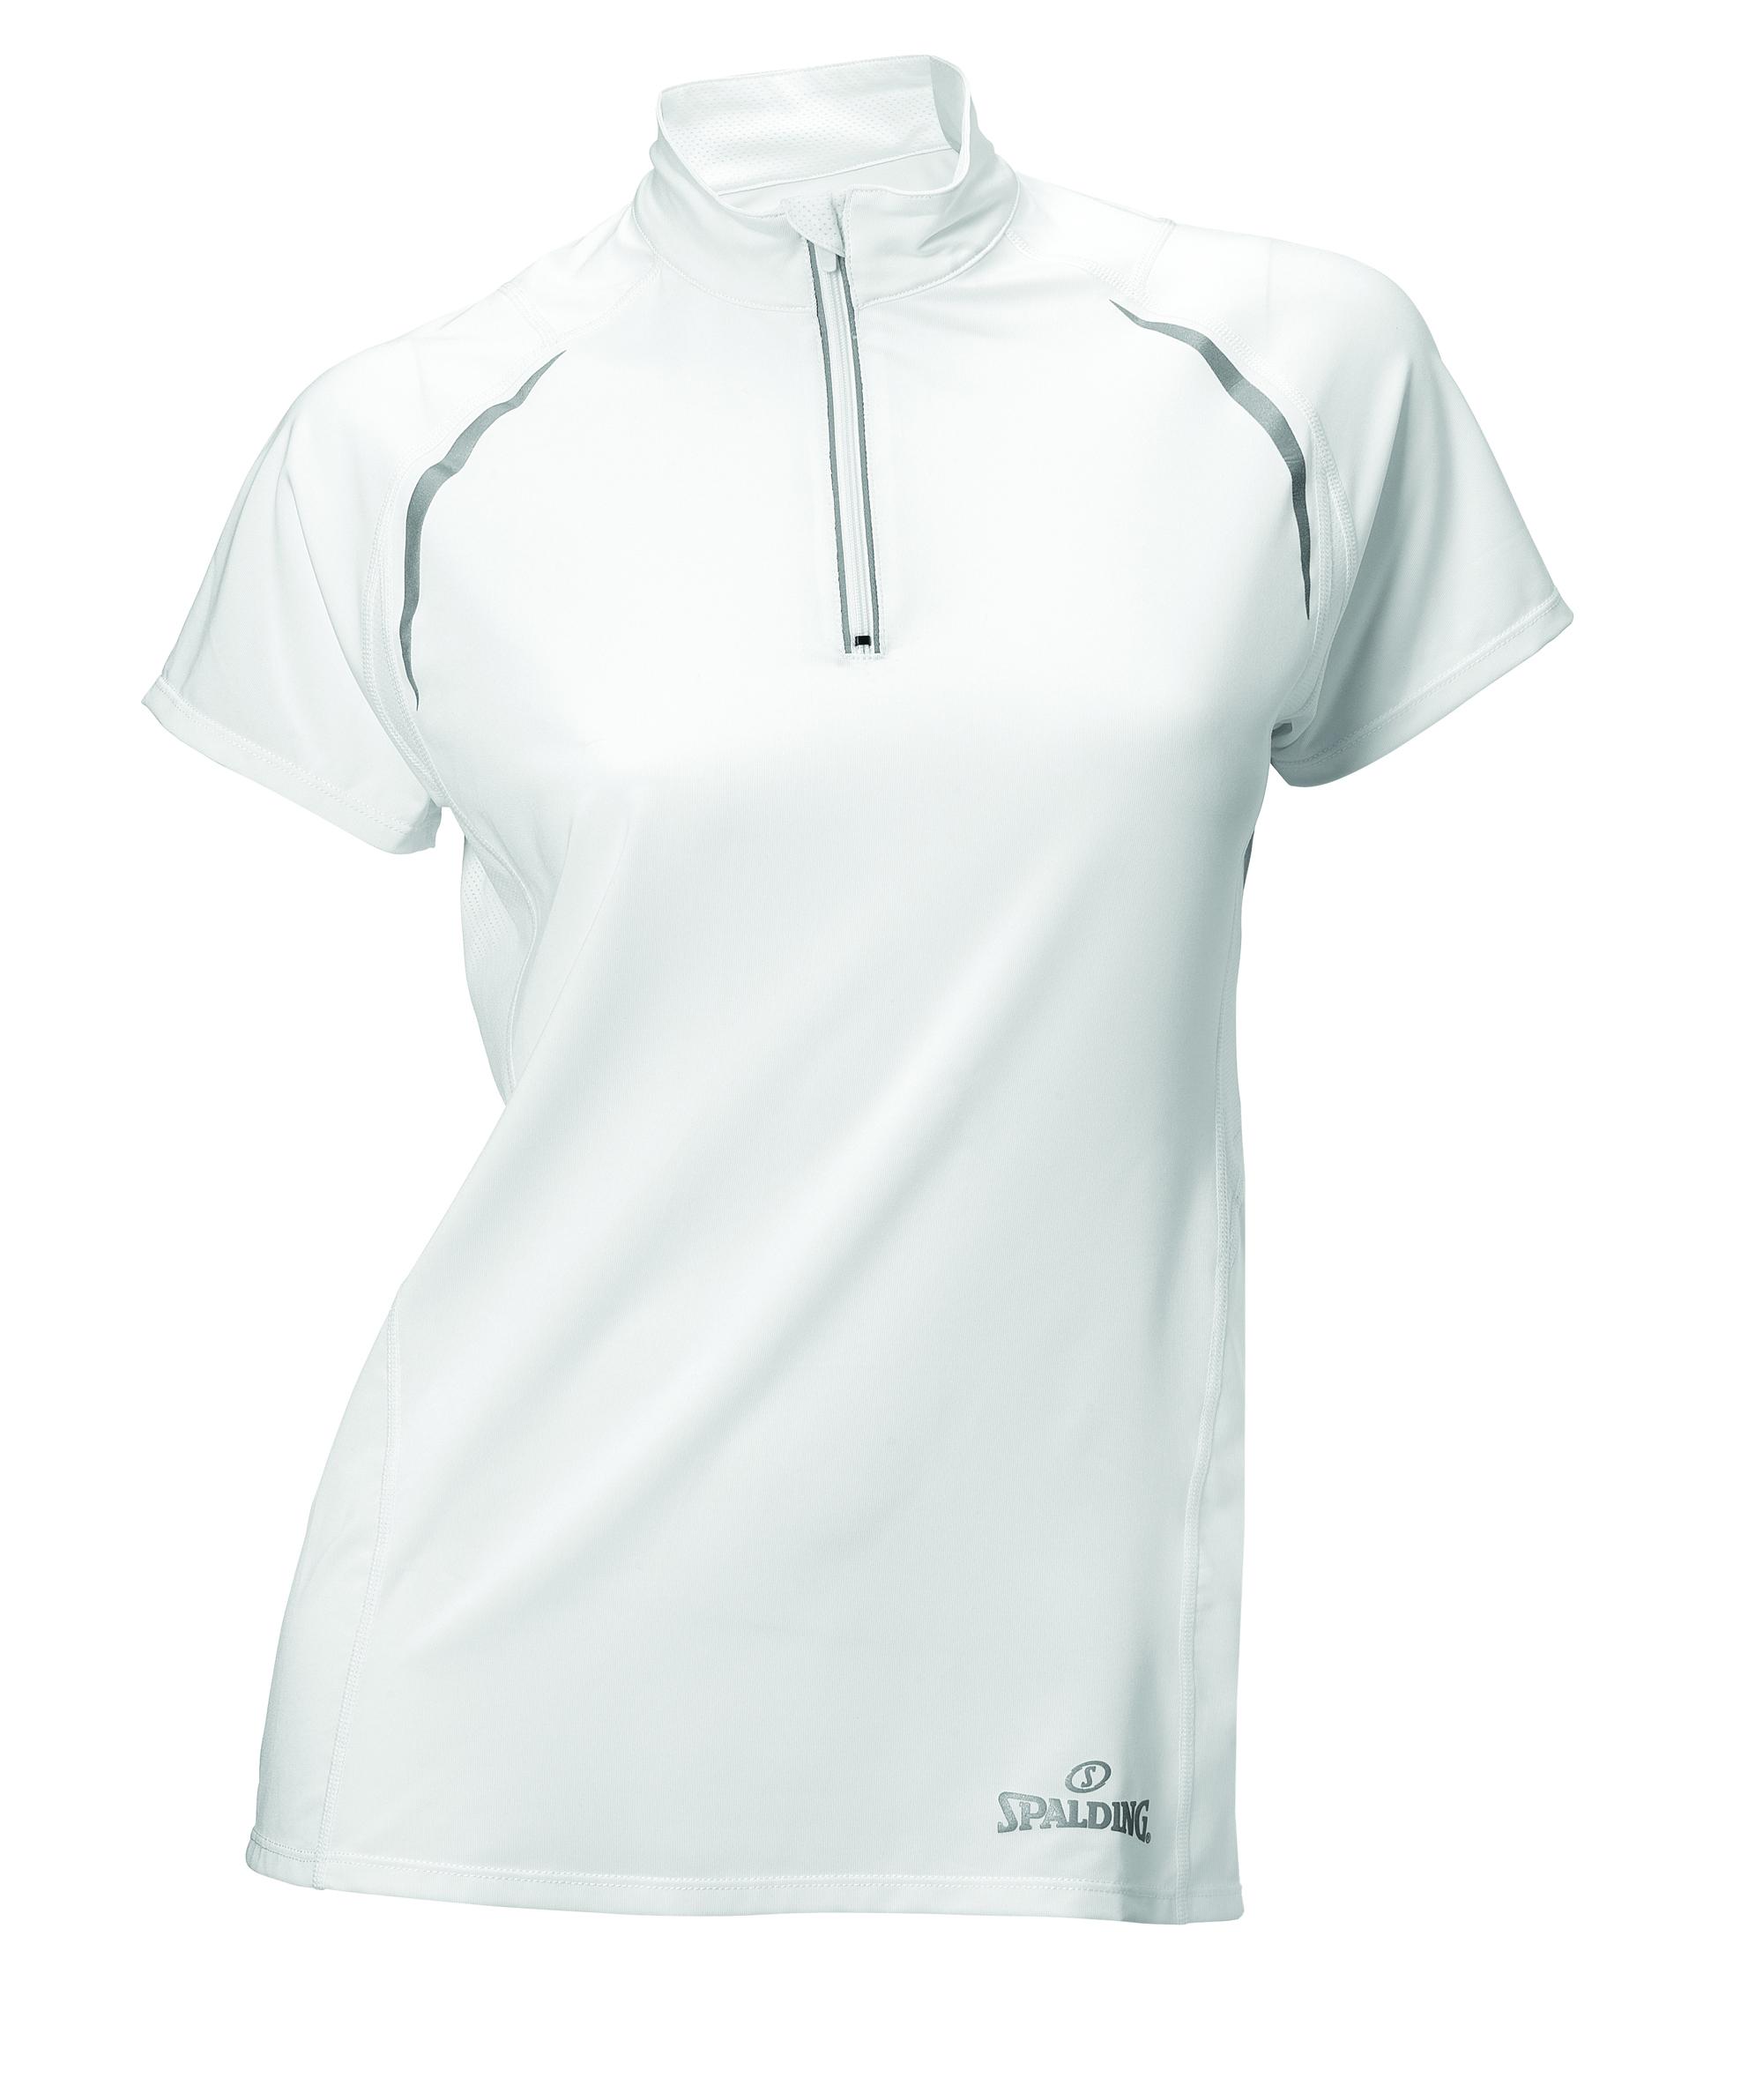 Endurance Zip Top Women - White - XS